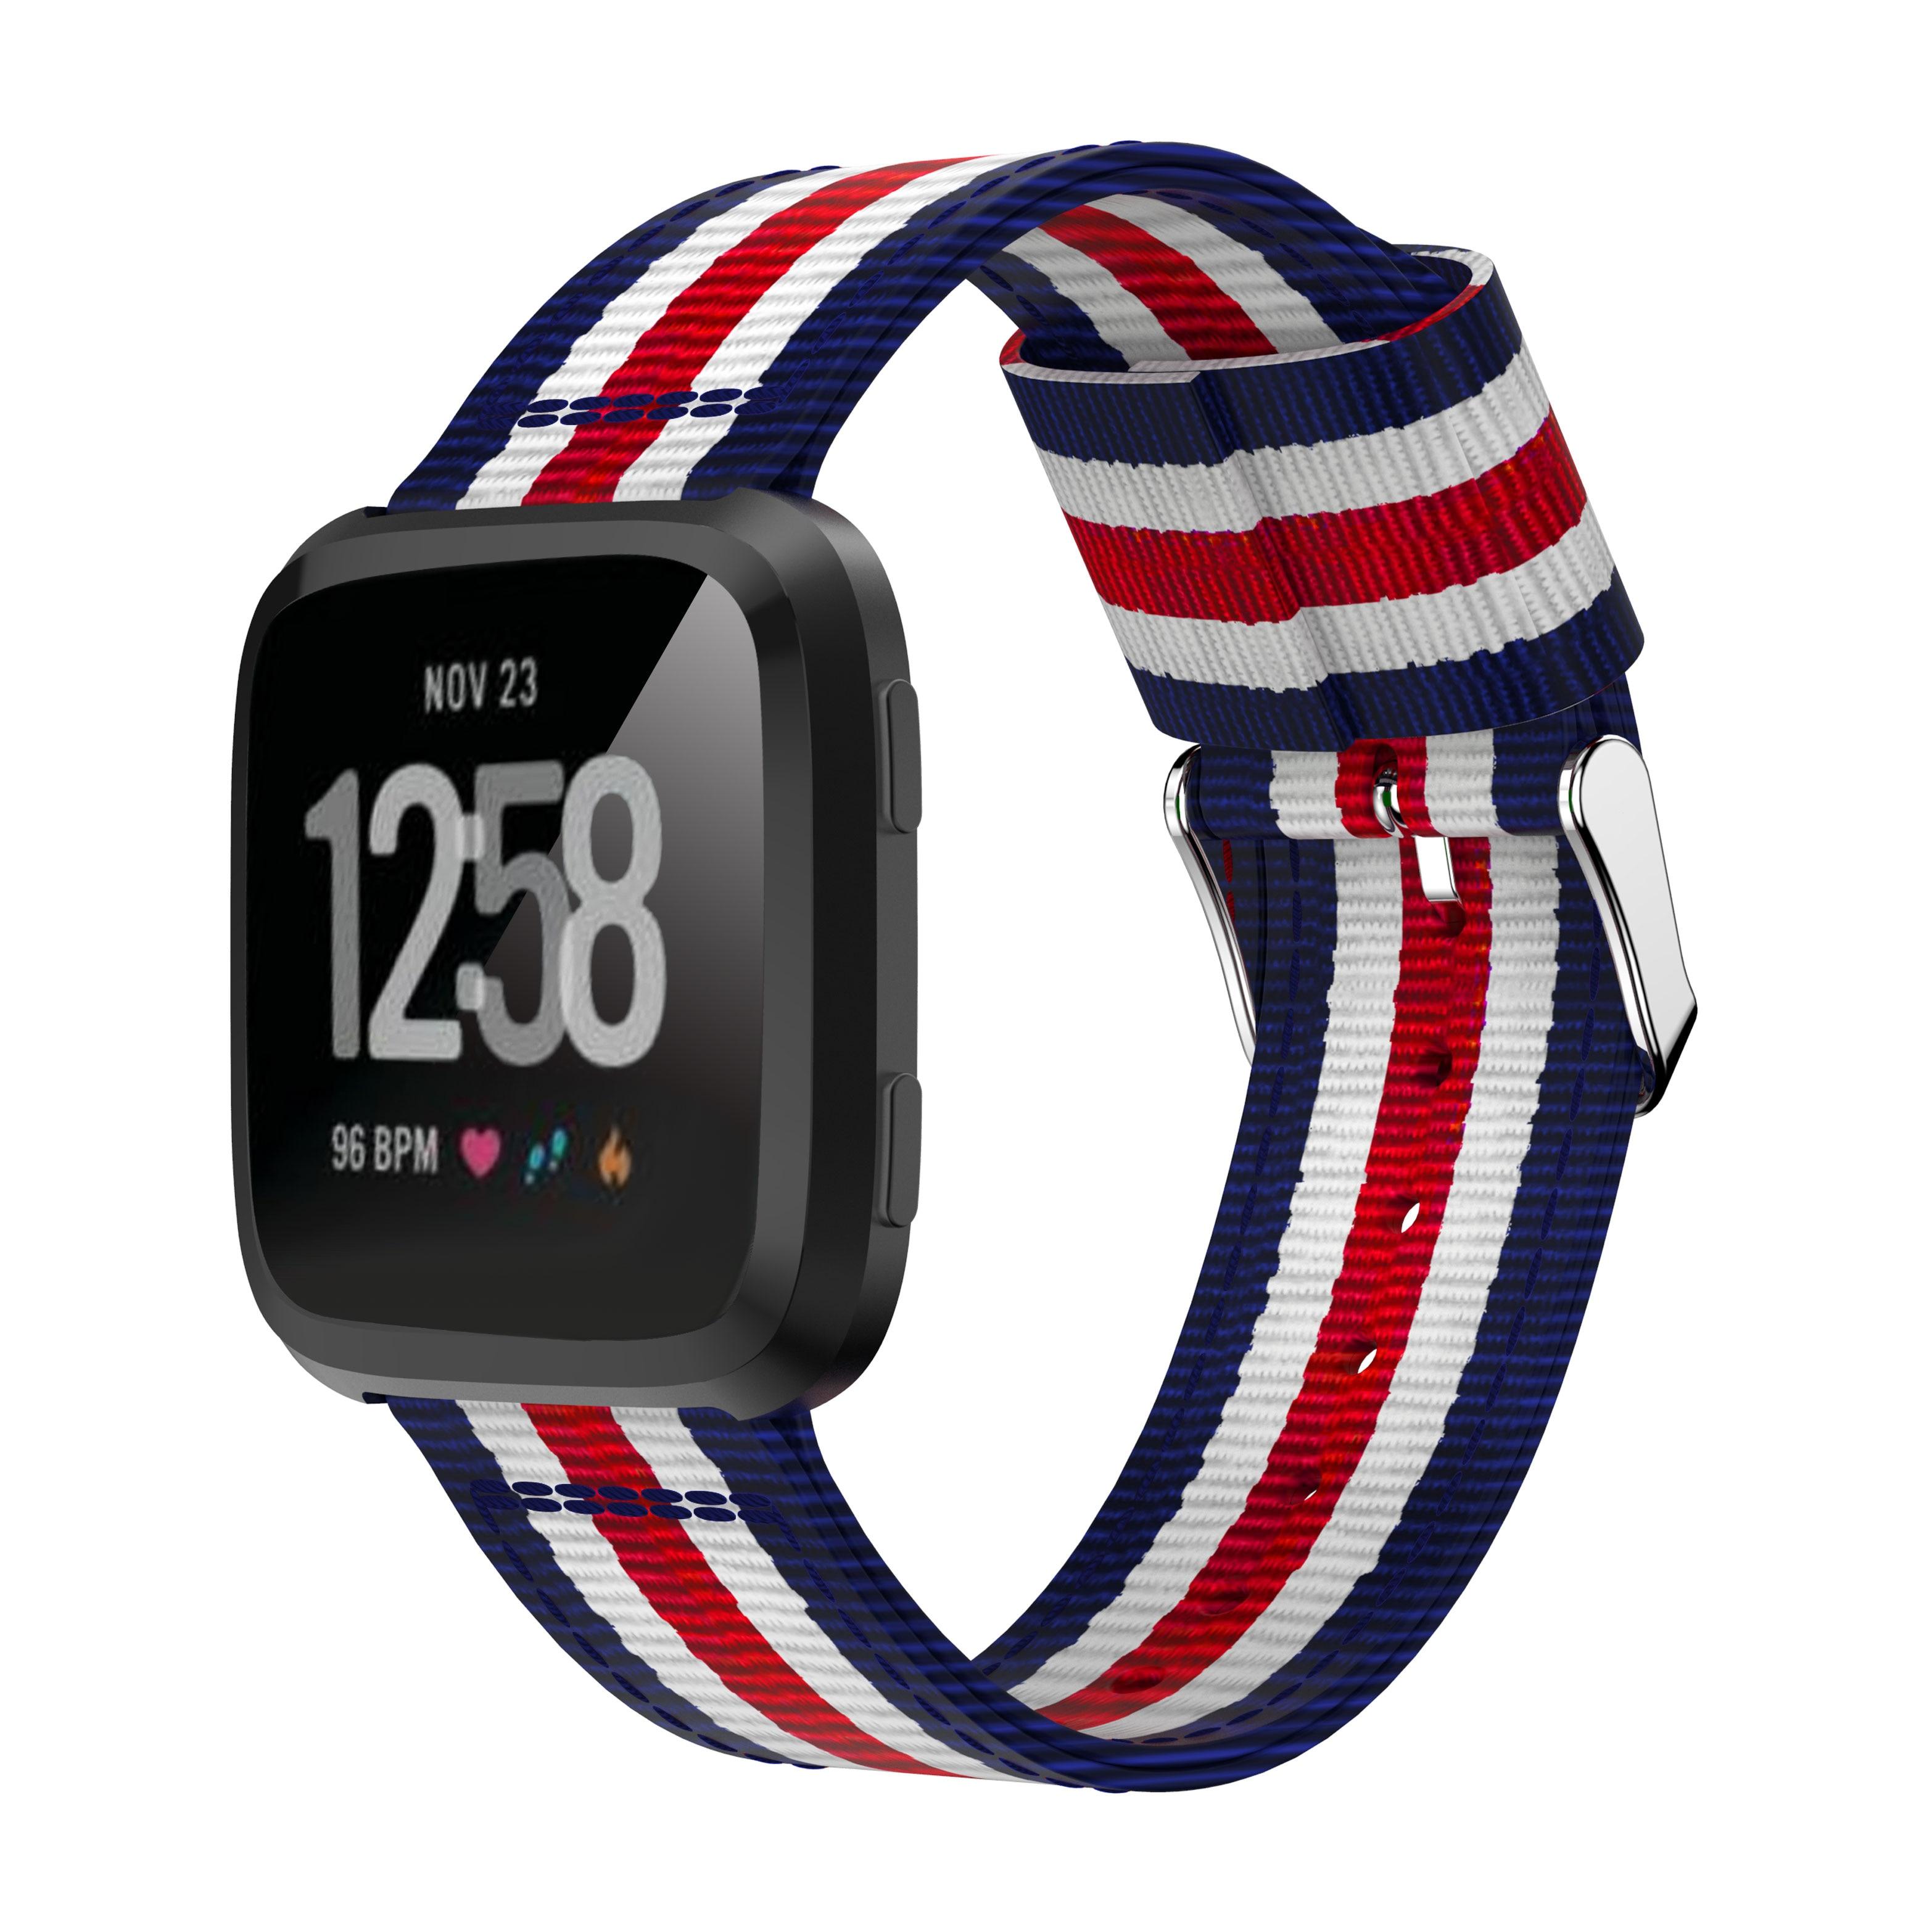 Yayuu 22mm universal Top Quality Vertical Nylon WatchBand Sports Strap Adjustable Wristband Replacement Smart Watch Straps